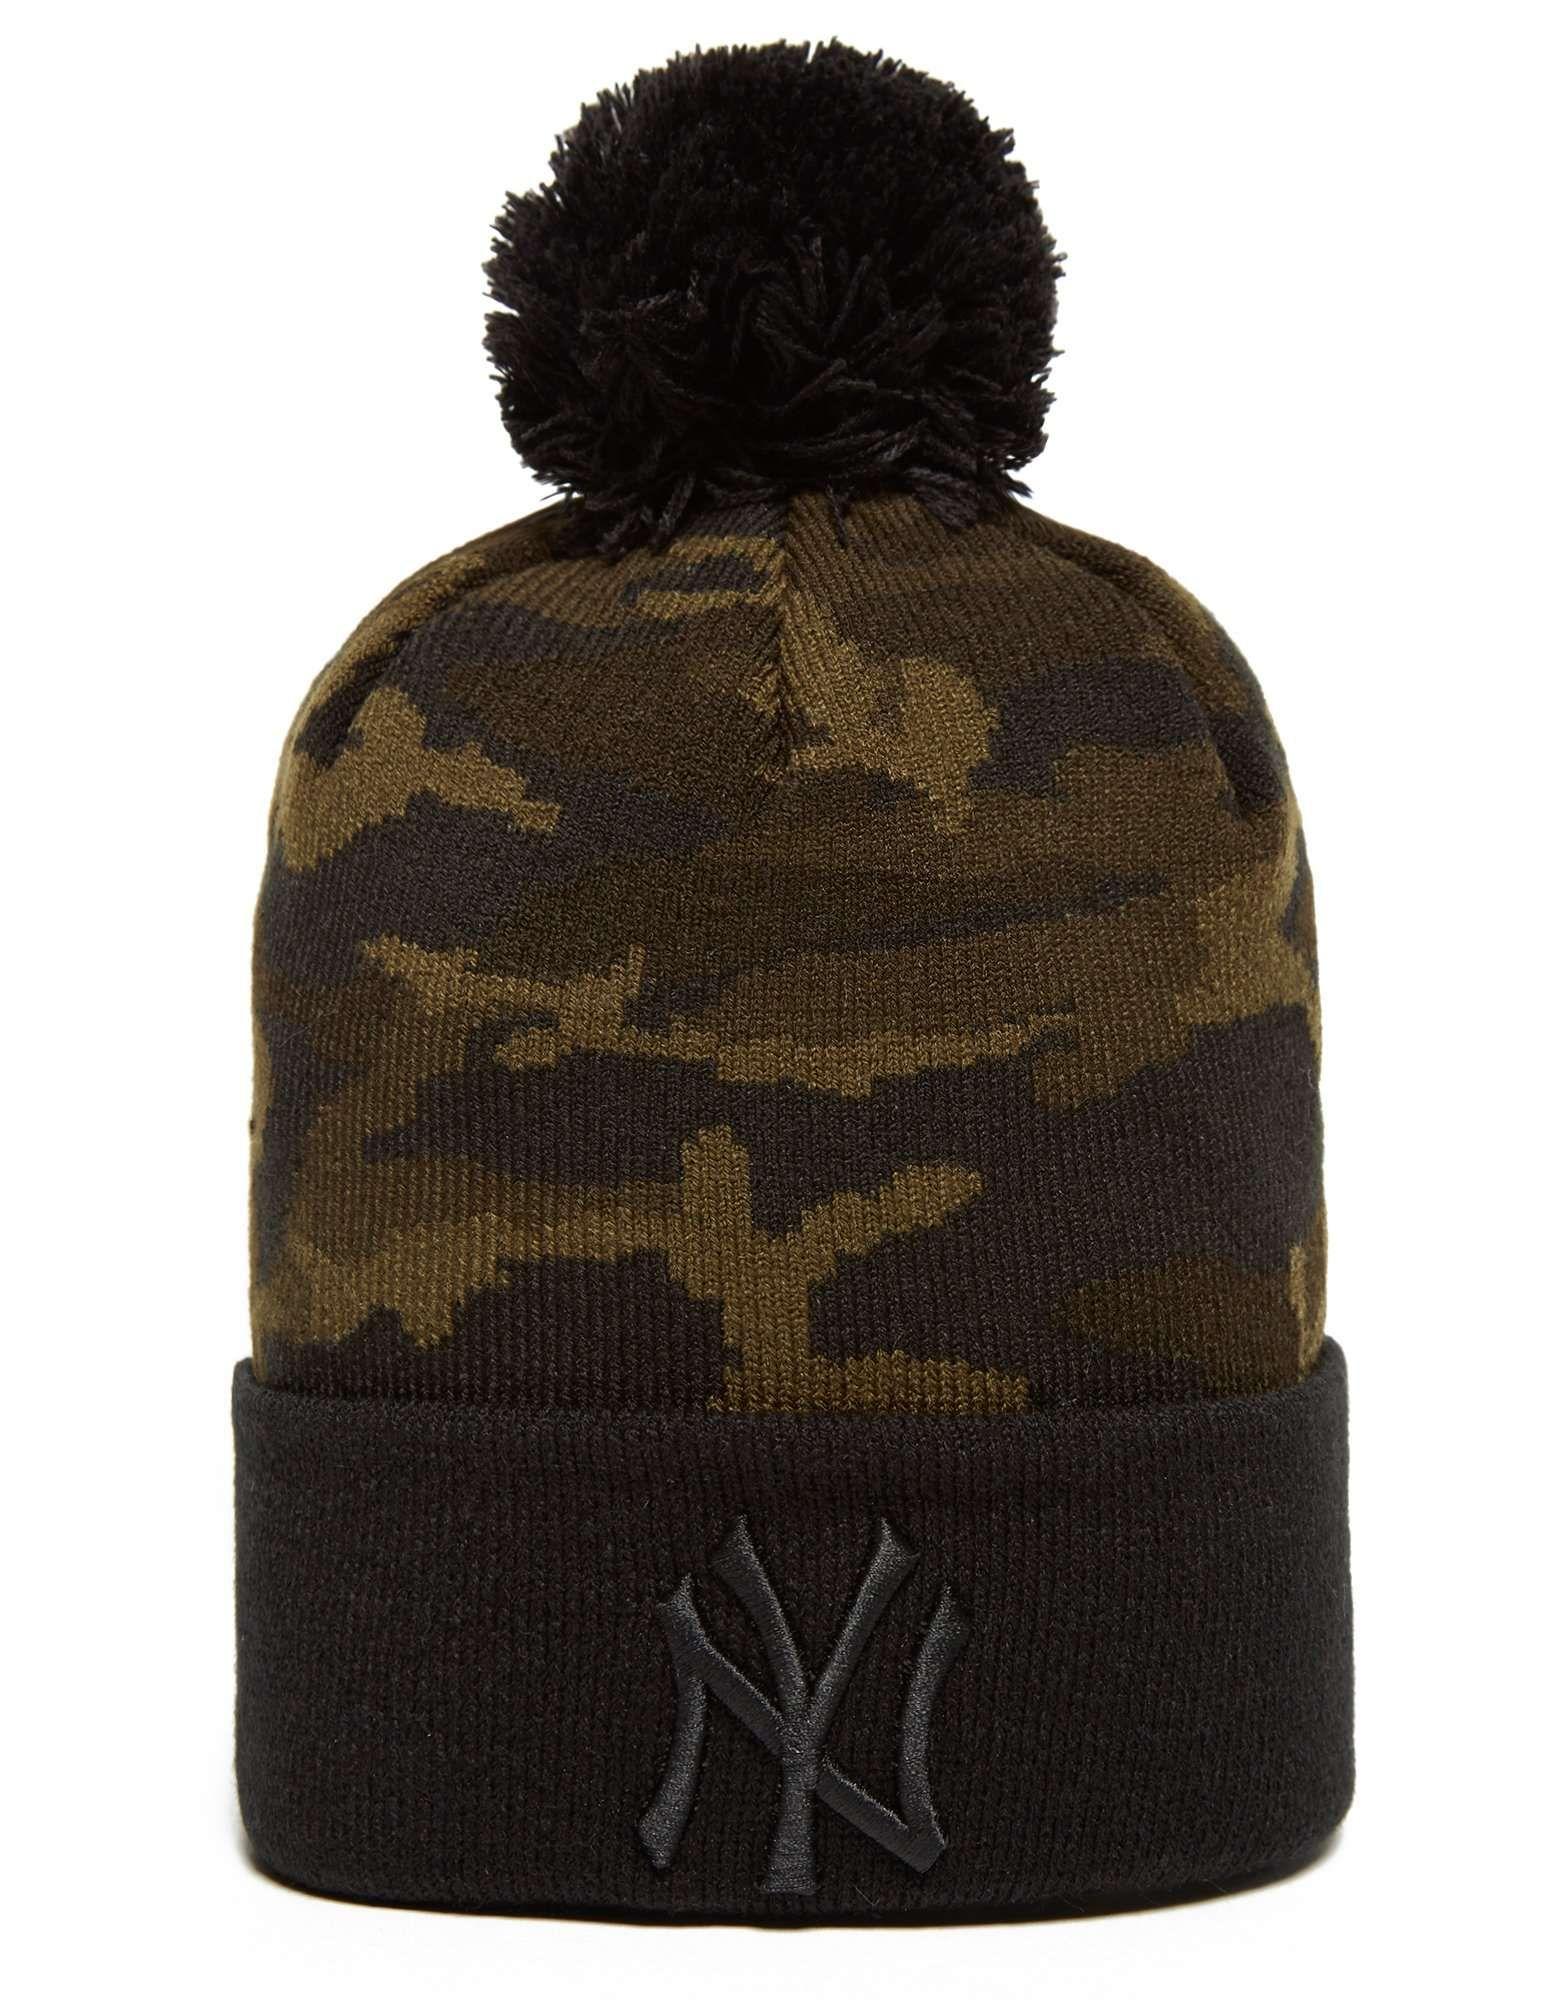 24f26580864 ... get new era mlb new york yankees camo beanie hat shop online for new  era mlb ...